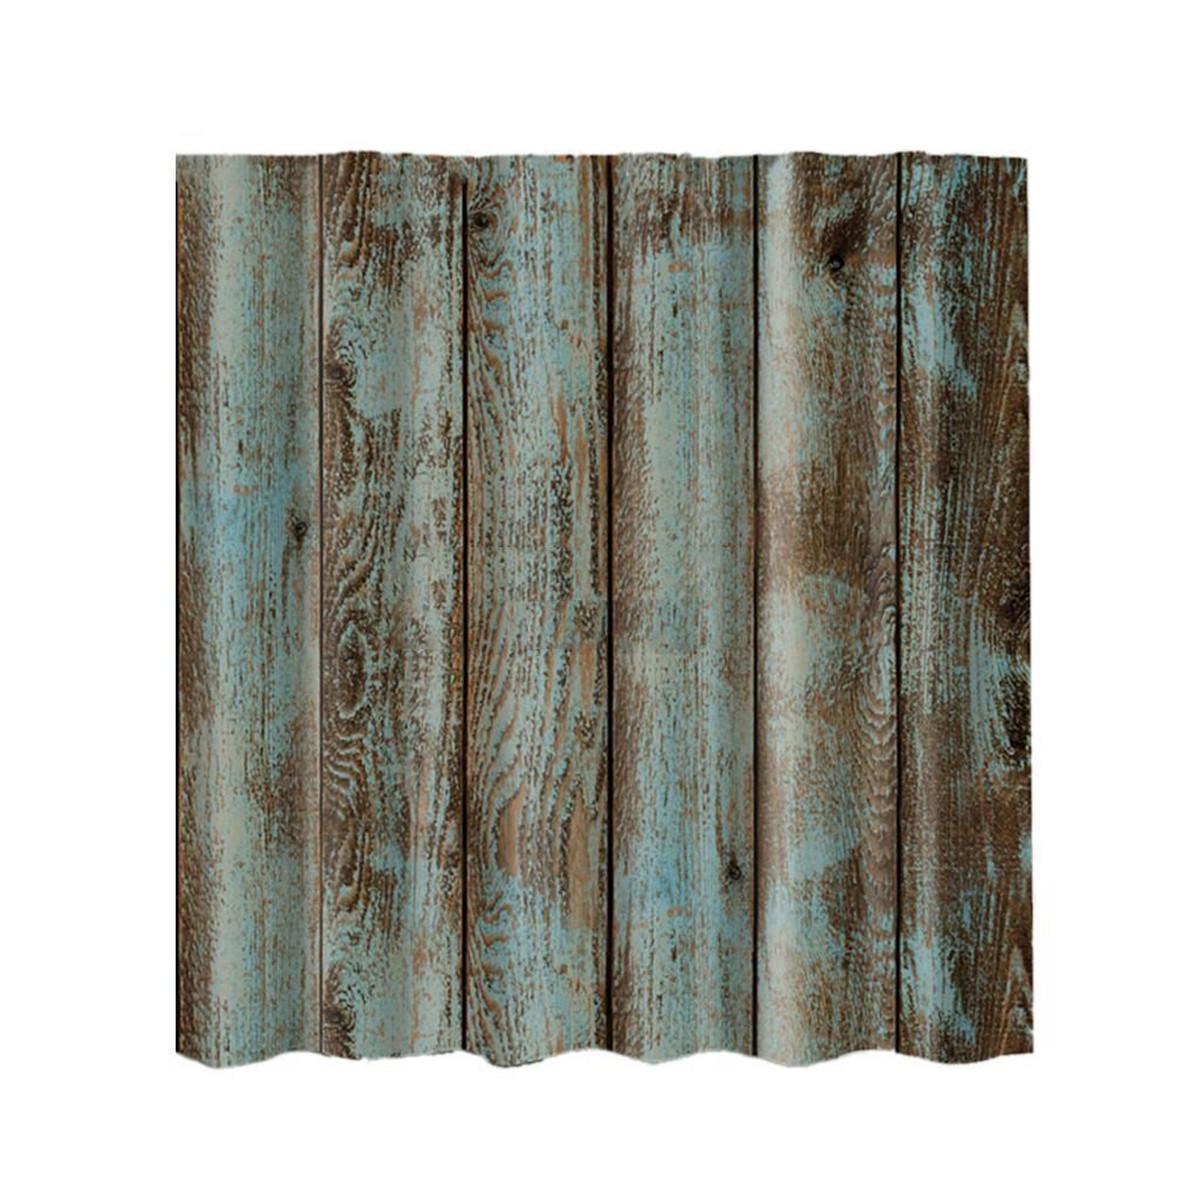 12 Hooks Shabby Wood Waterproof Polyester Fabric Shower Curtain Bathroom Sheer Ebay